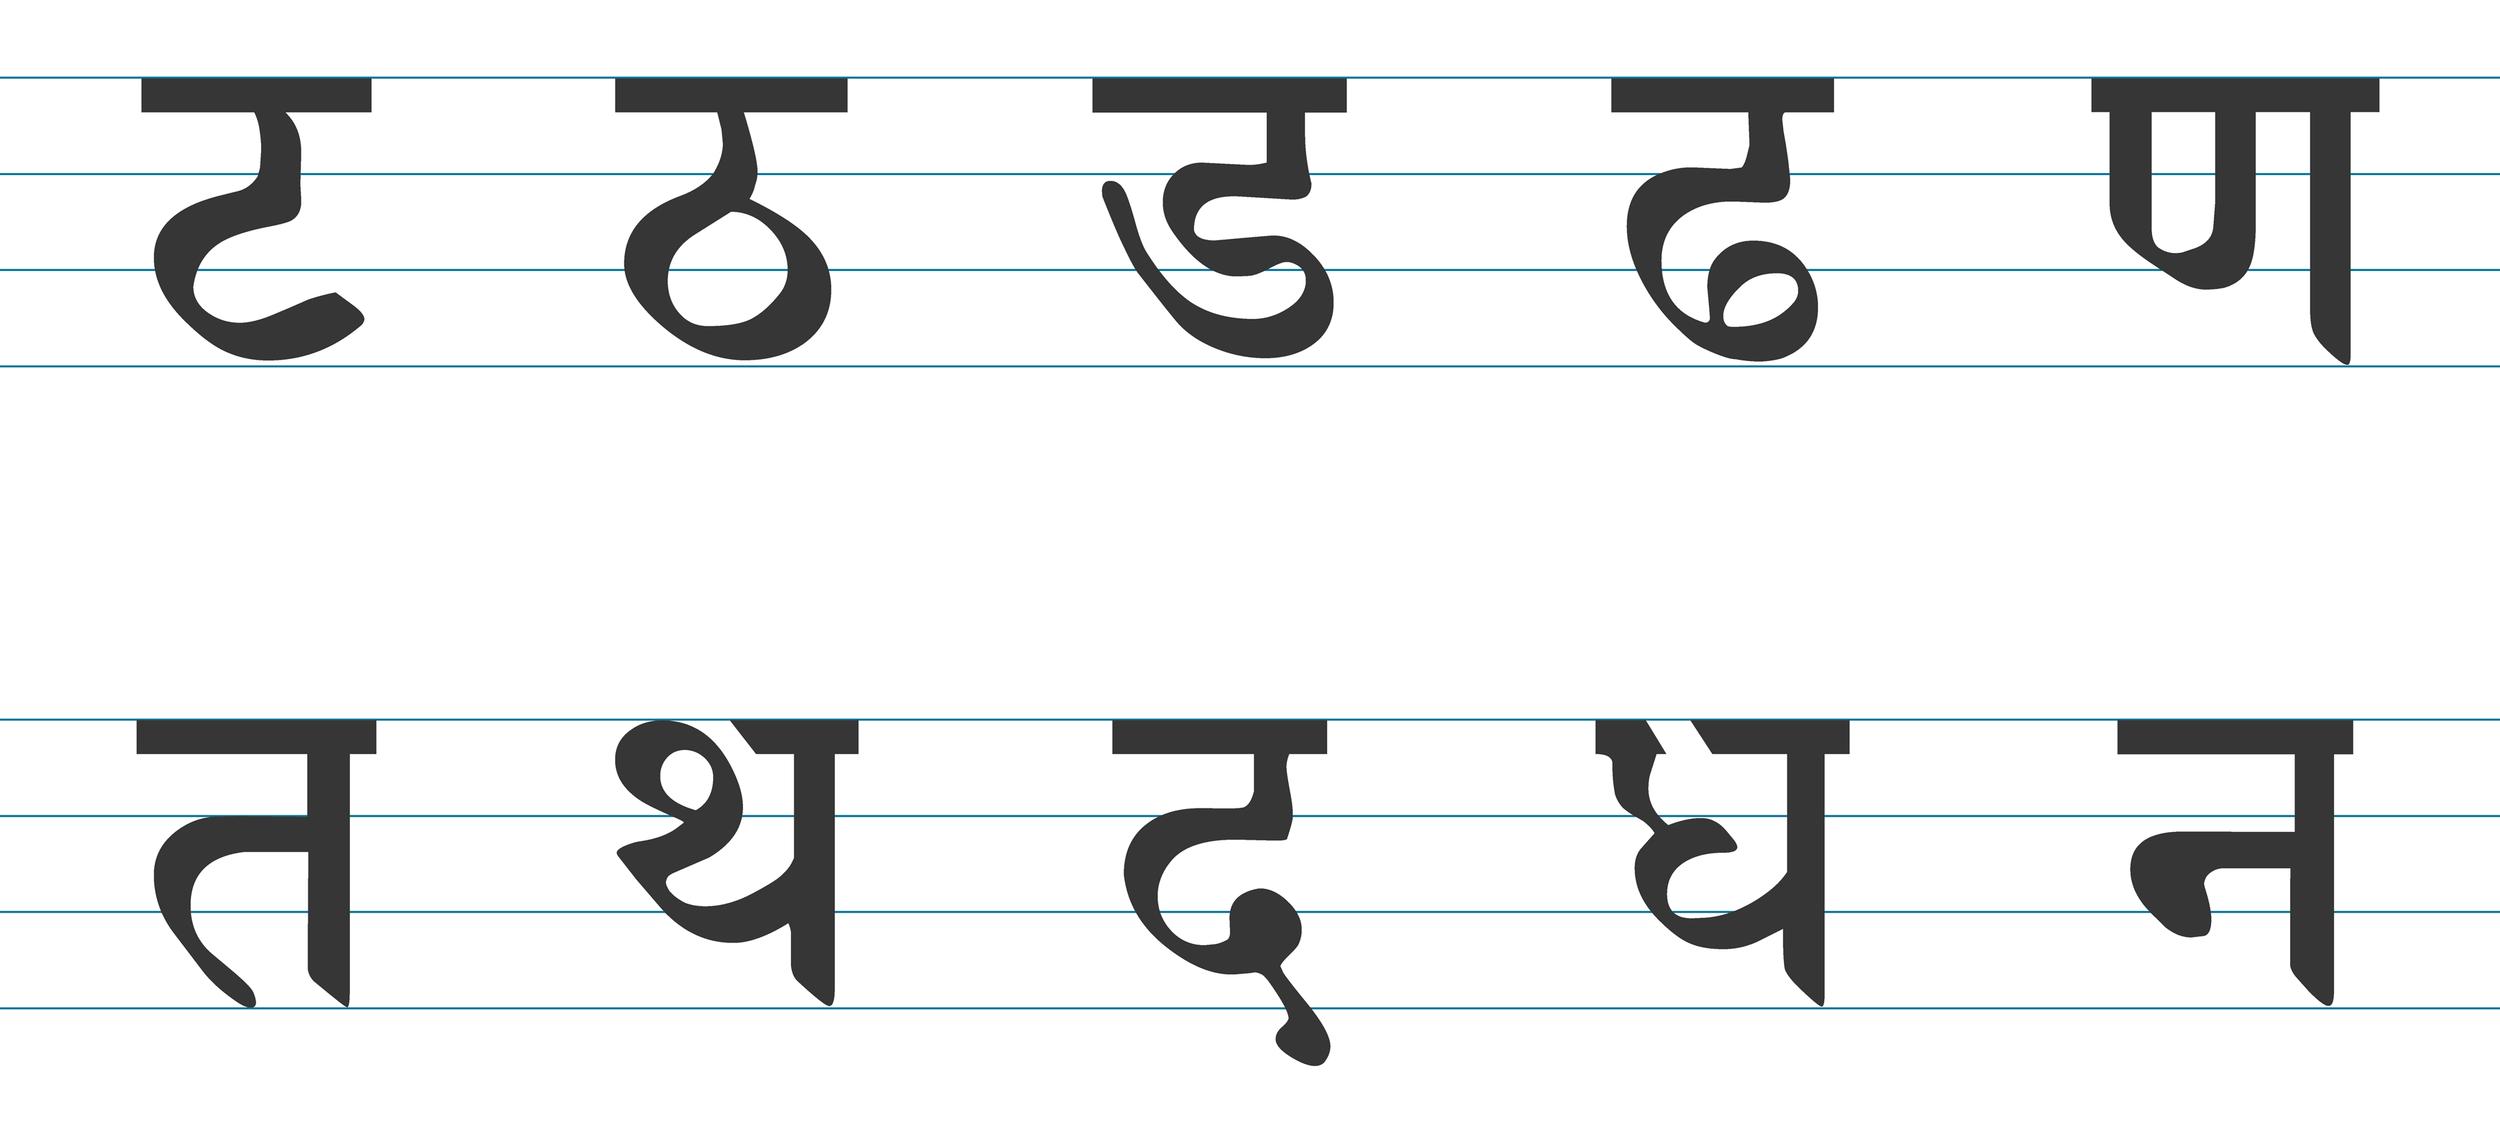 4A1-writing-consonants.png